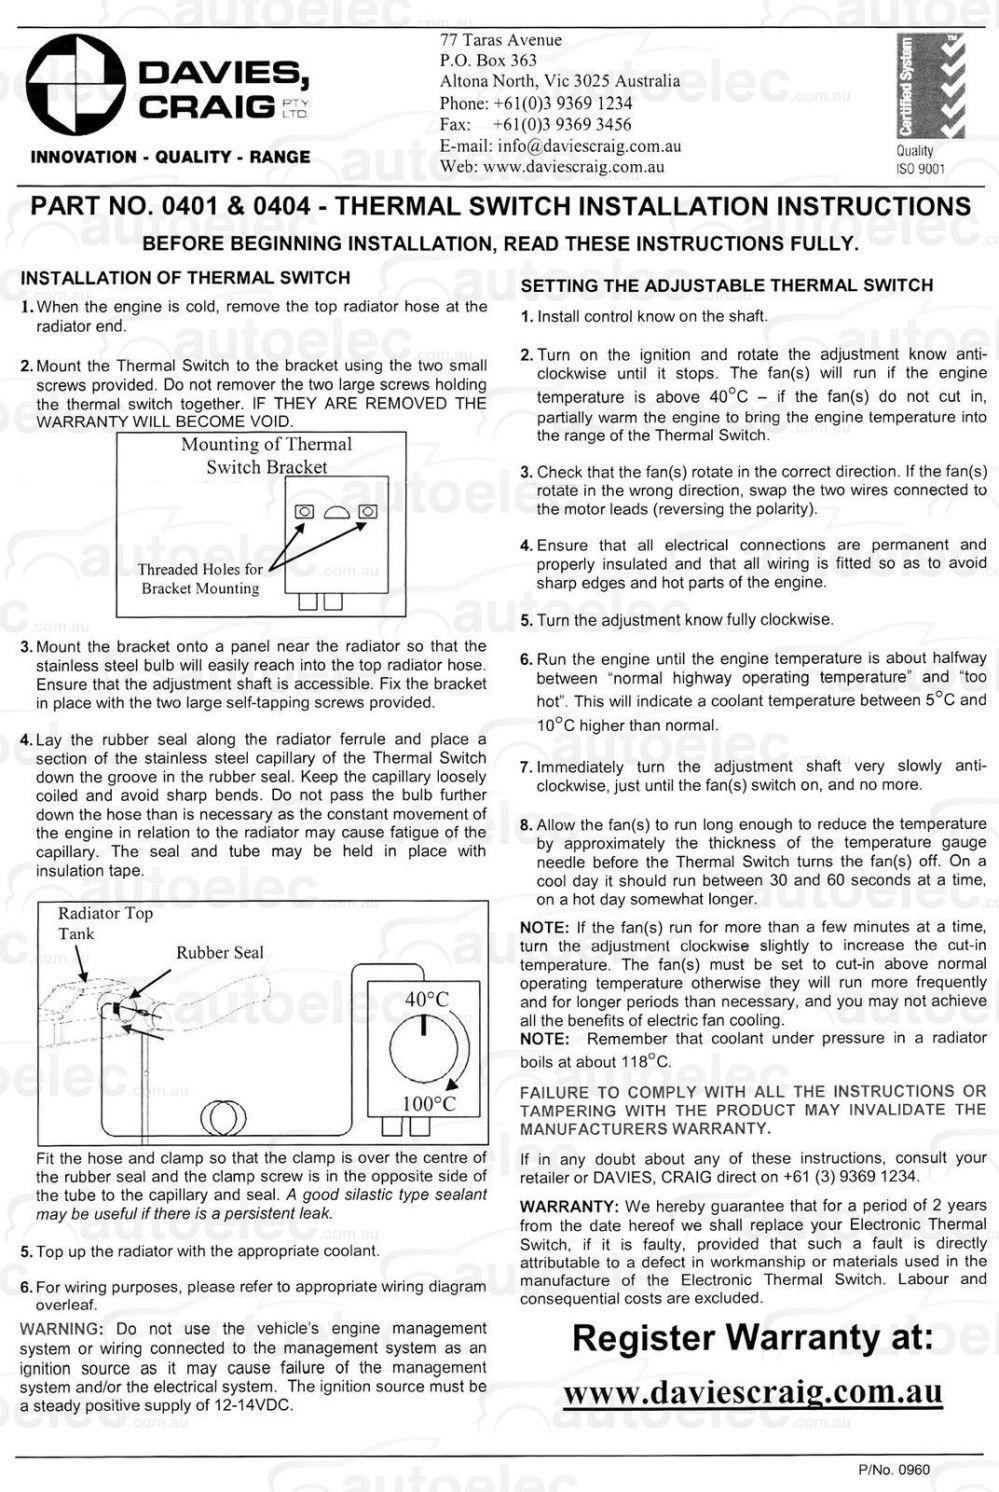 medium resolution of davies craig mechanical thermatic radiator fan